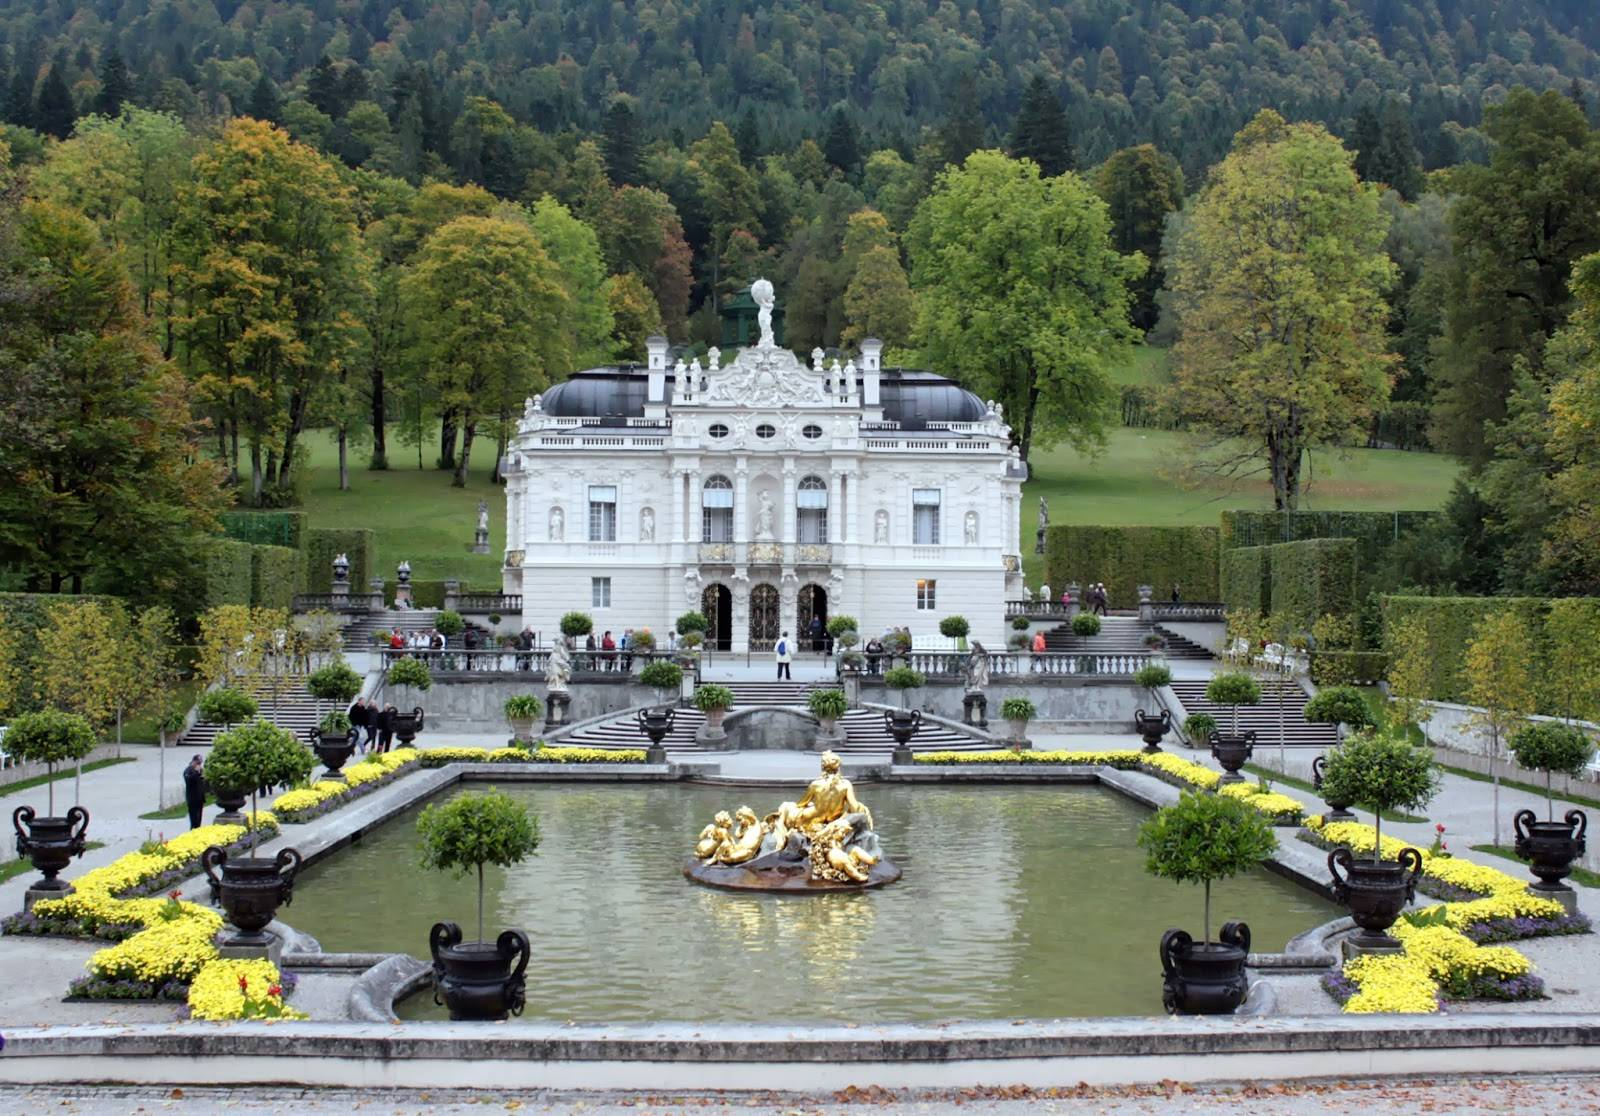 Замок линдерхоф в баварии, история и архитектура